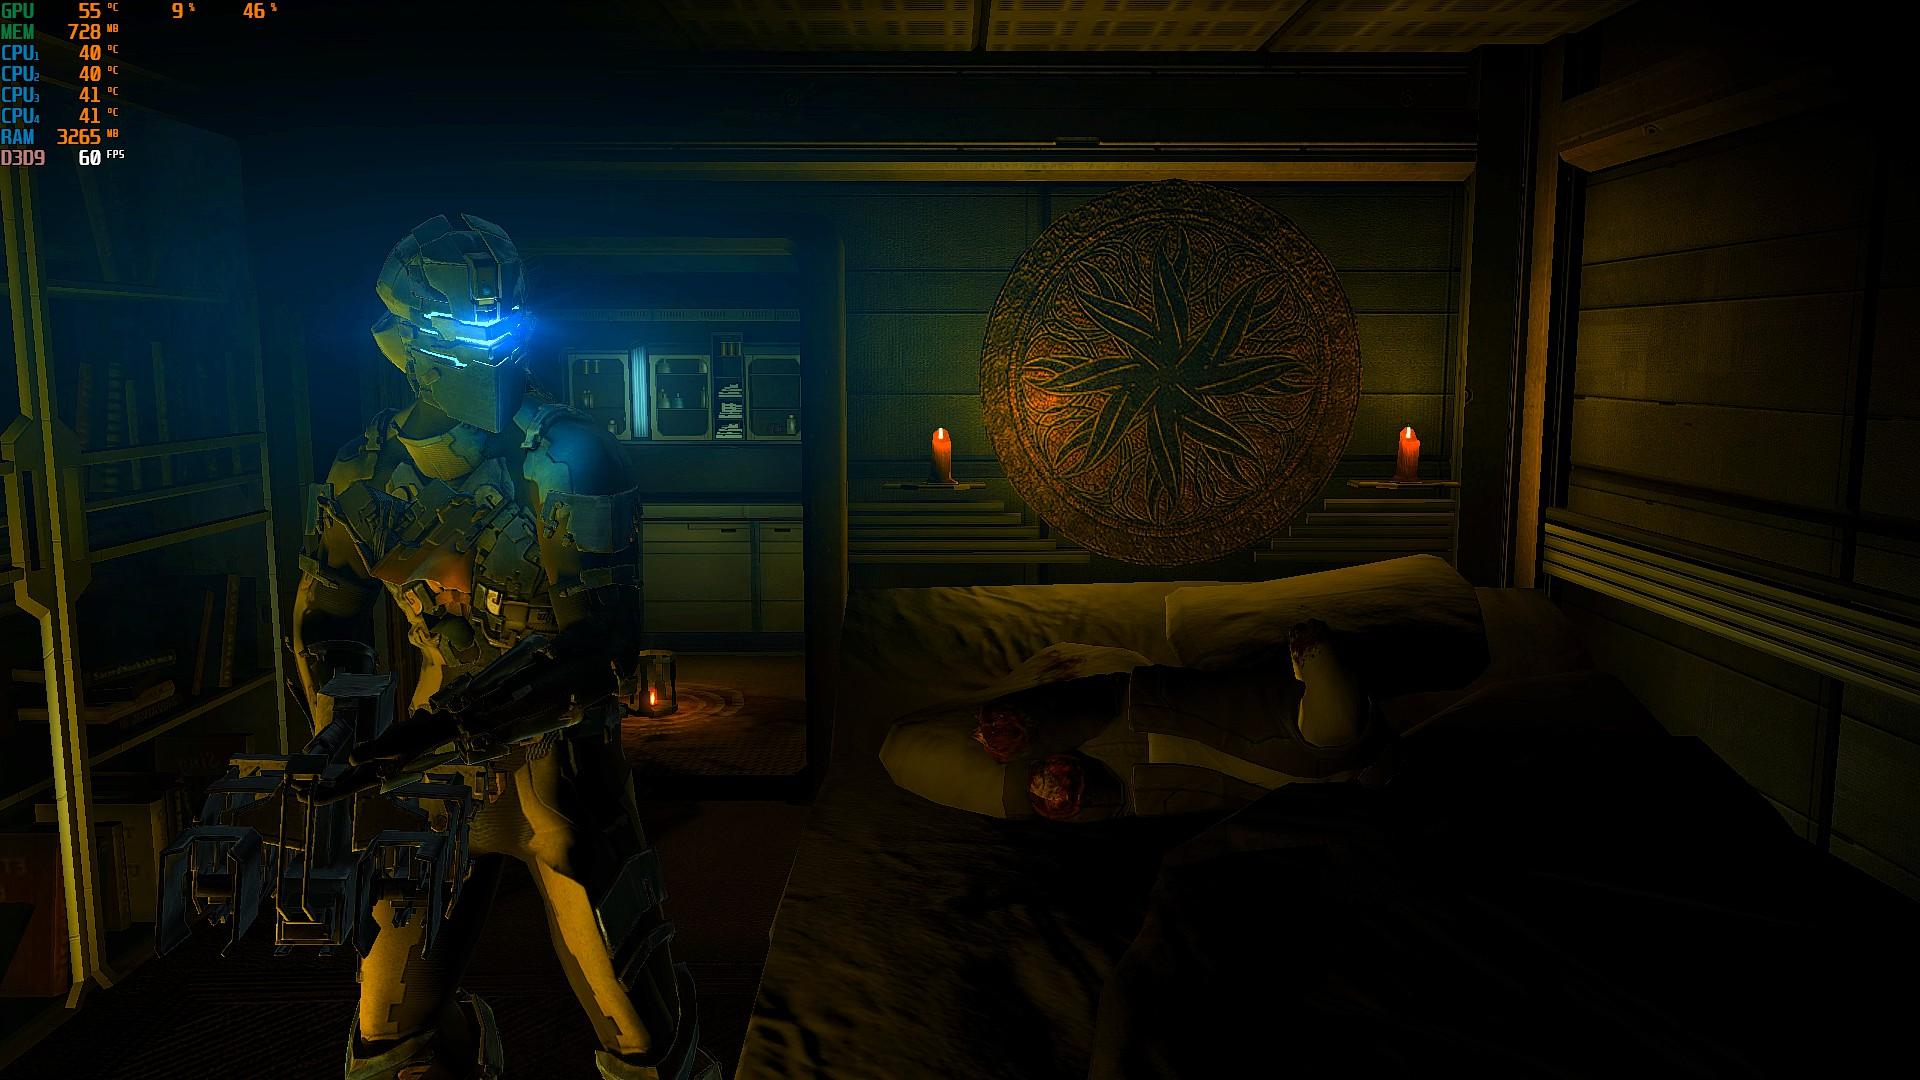 00069.Jpg - Dead Space 2